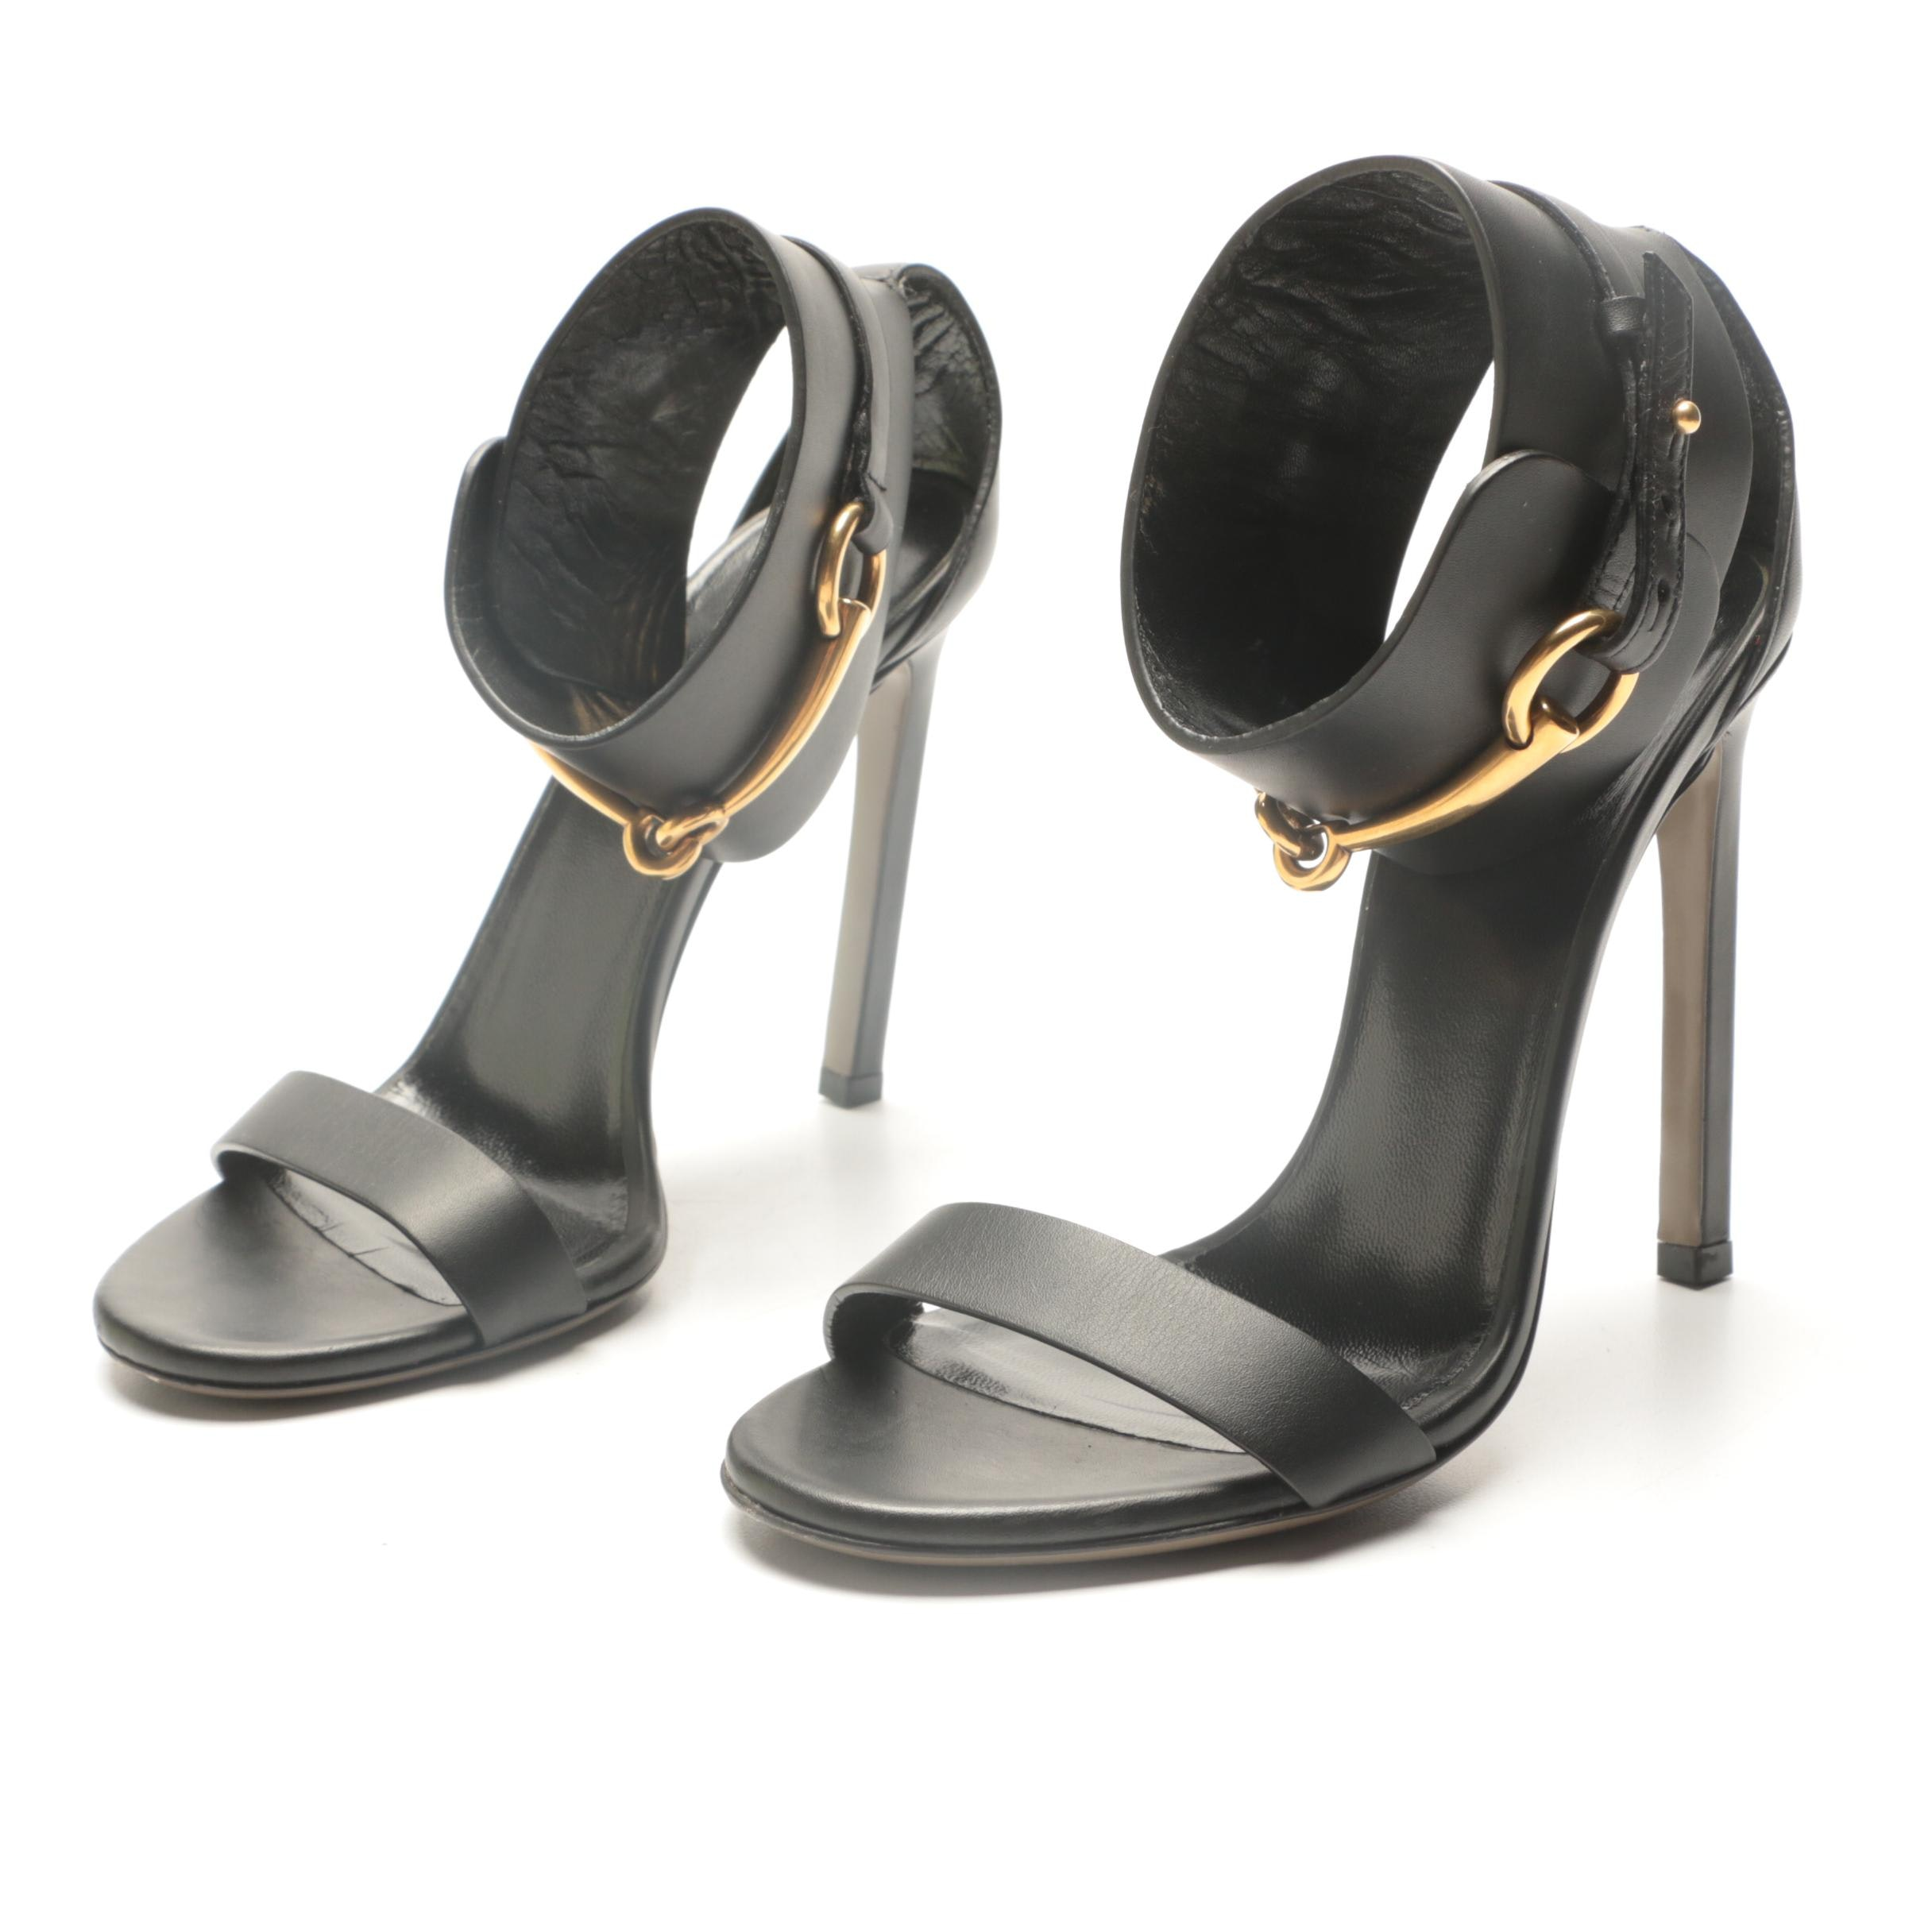 Gucci Ursula Black Leather Horsebit Ankle Cuff Sandals